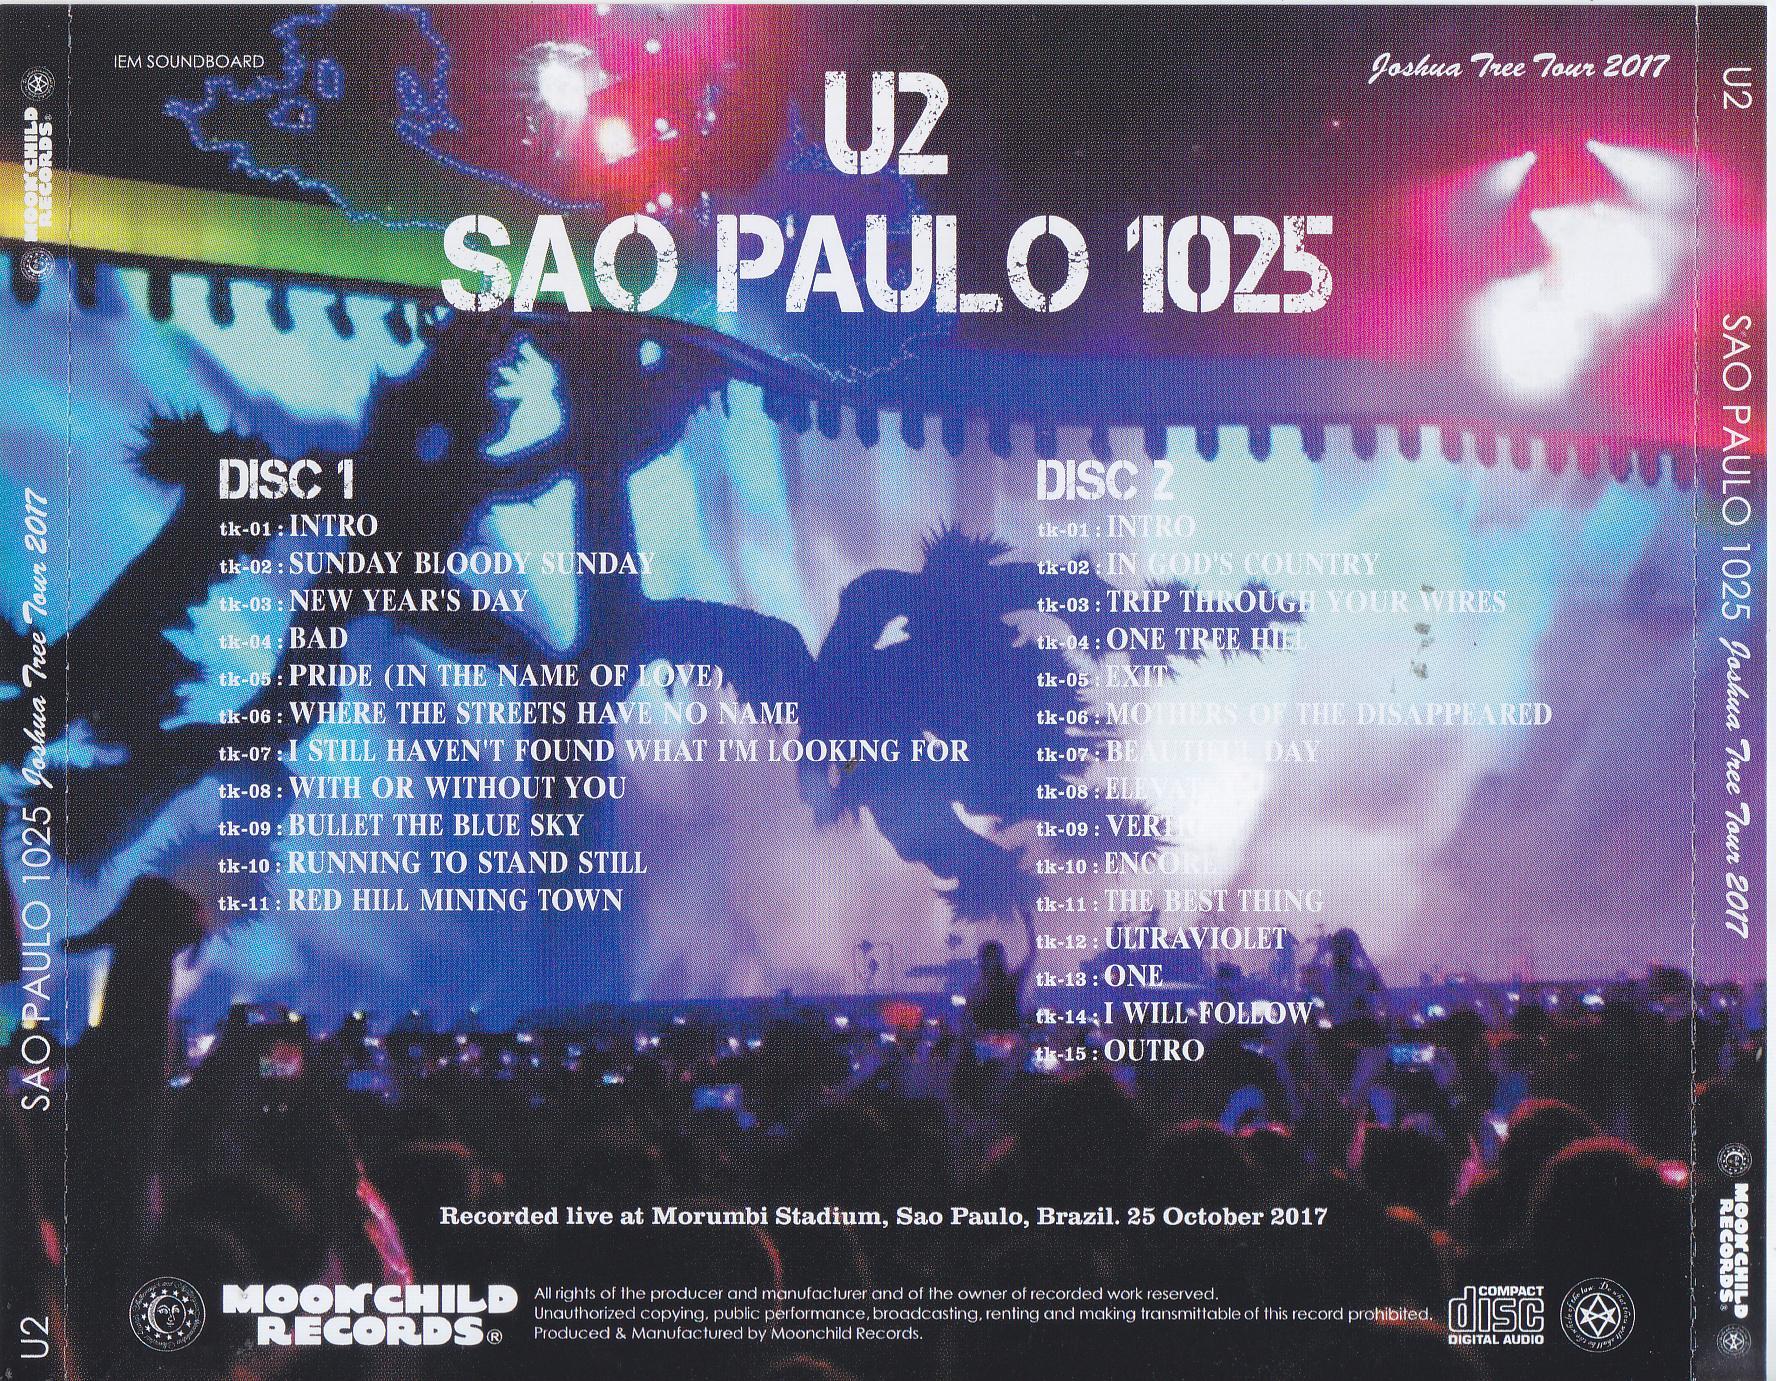 U2 - Sao Paulo 1025 (2CD) Moonchild Records  MC-127